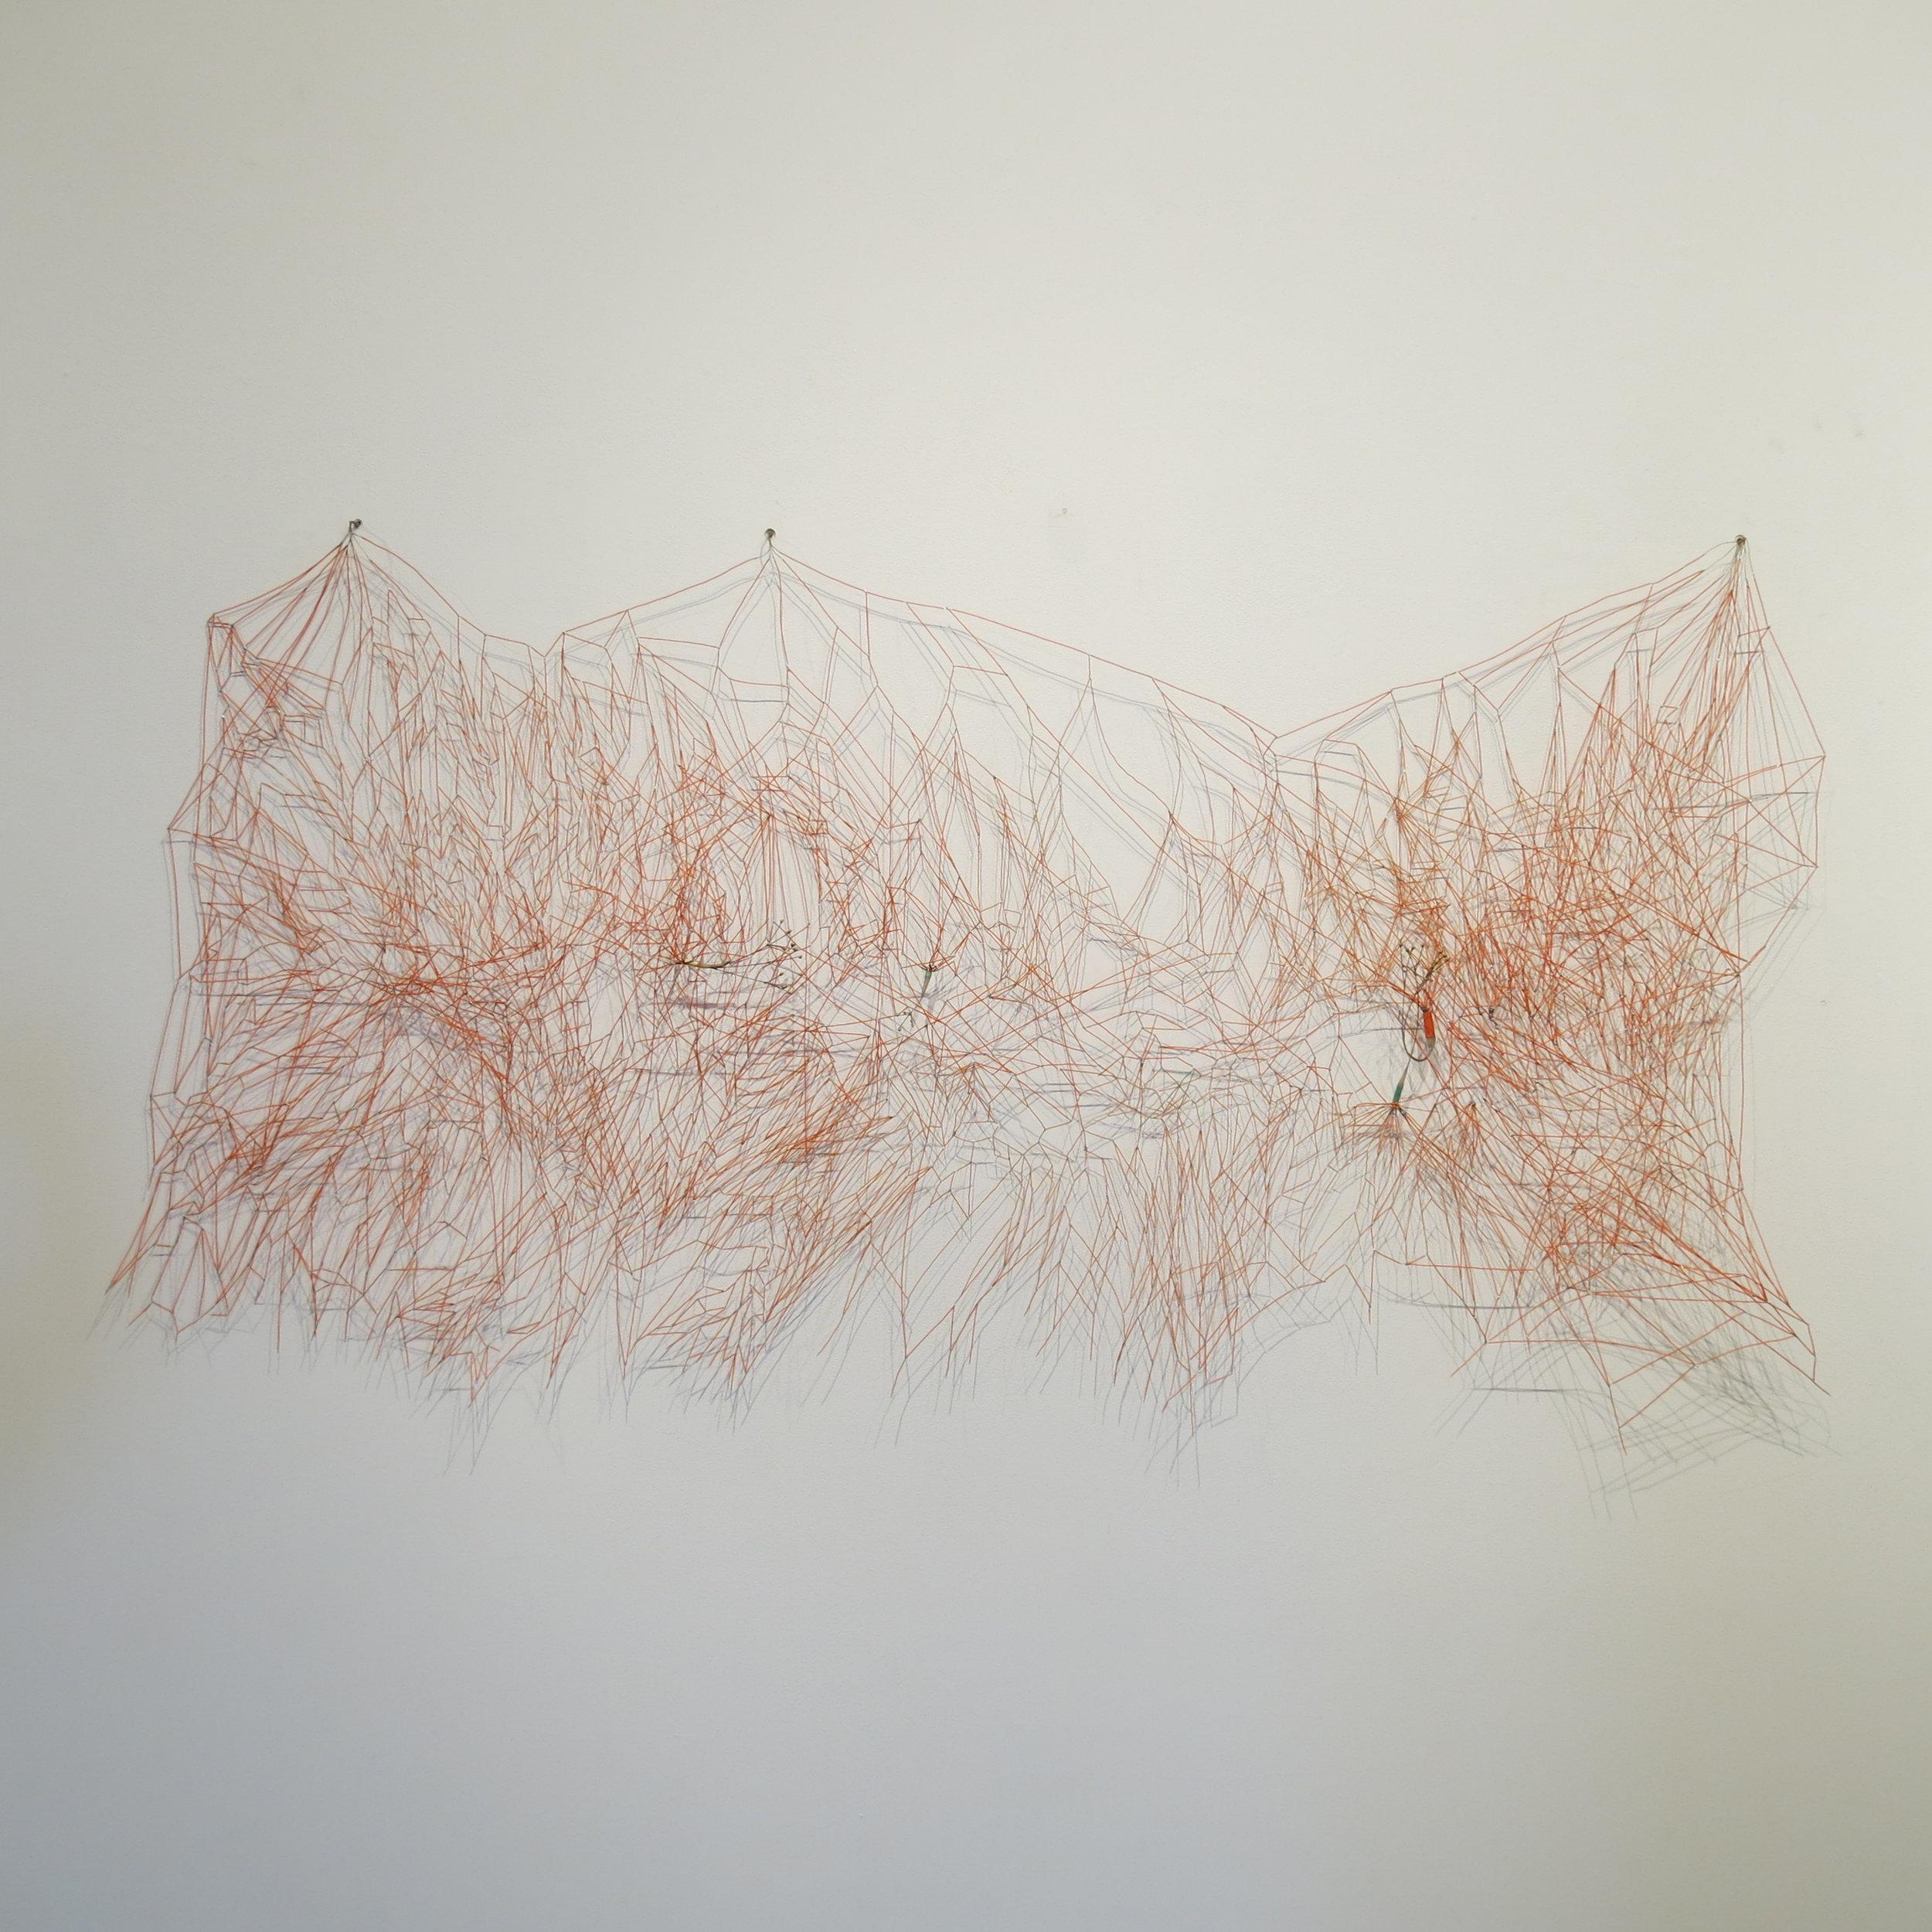 Markus Baenziger, On the Margin , 2014, wire & brass, 30h x 60w x 4d in.